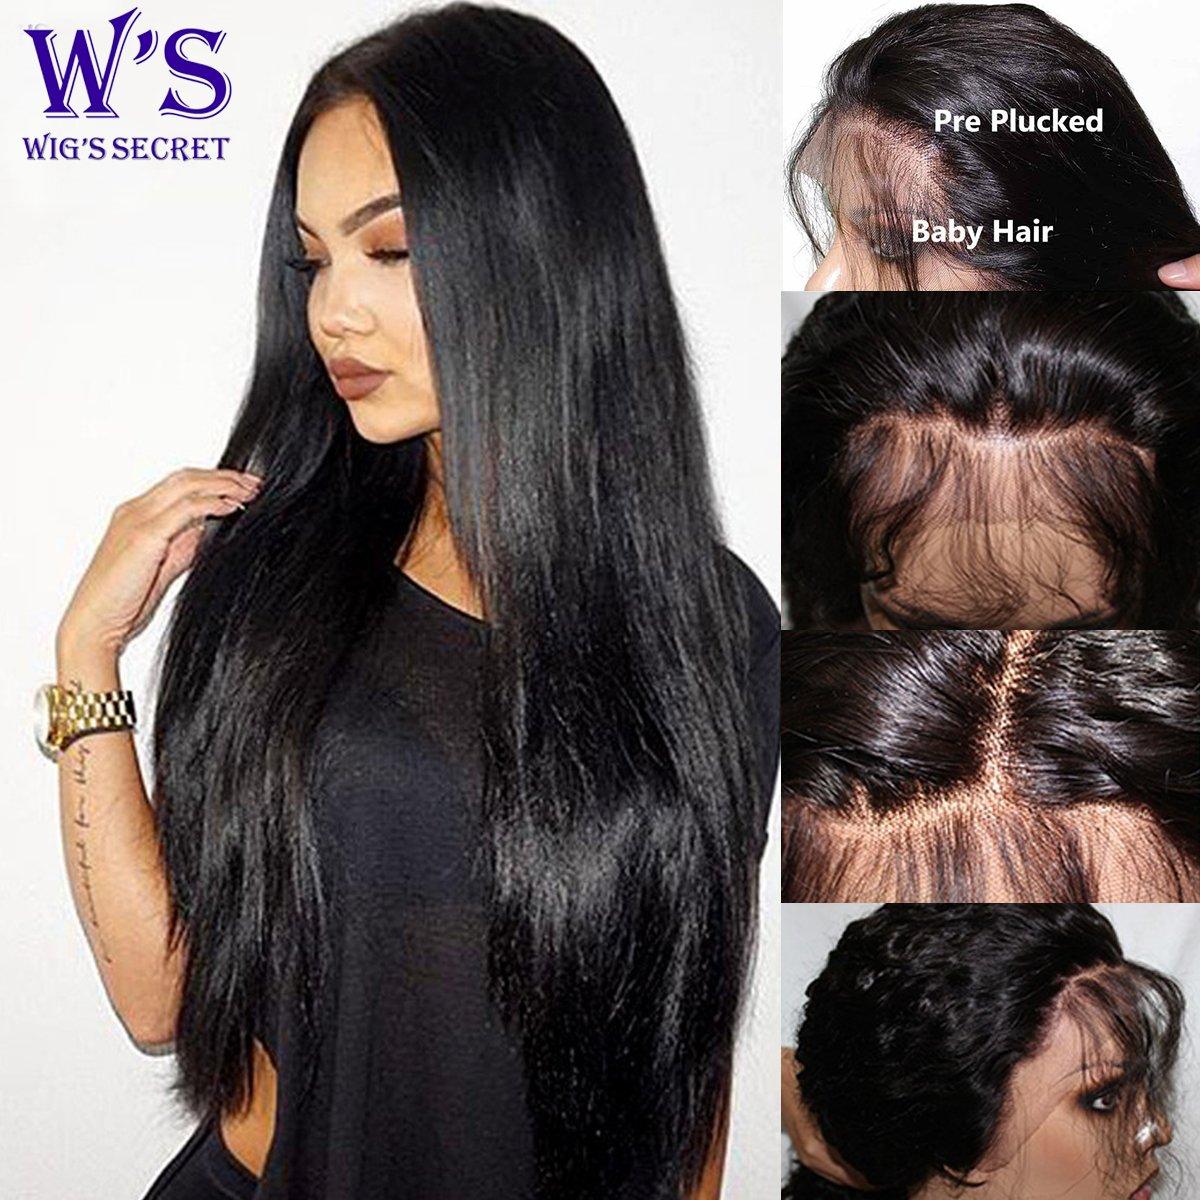 S-noilite Human Hair Lace Front Wigs 100% Brazilian Virgin Human Hair Full Head Wigs For Black Women Ladies ( 14 inch 1B - Off Black - Straight)